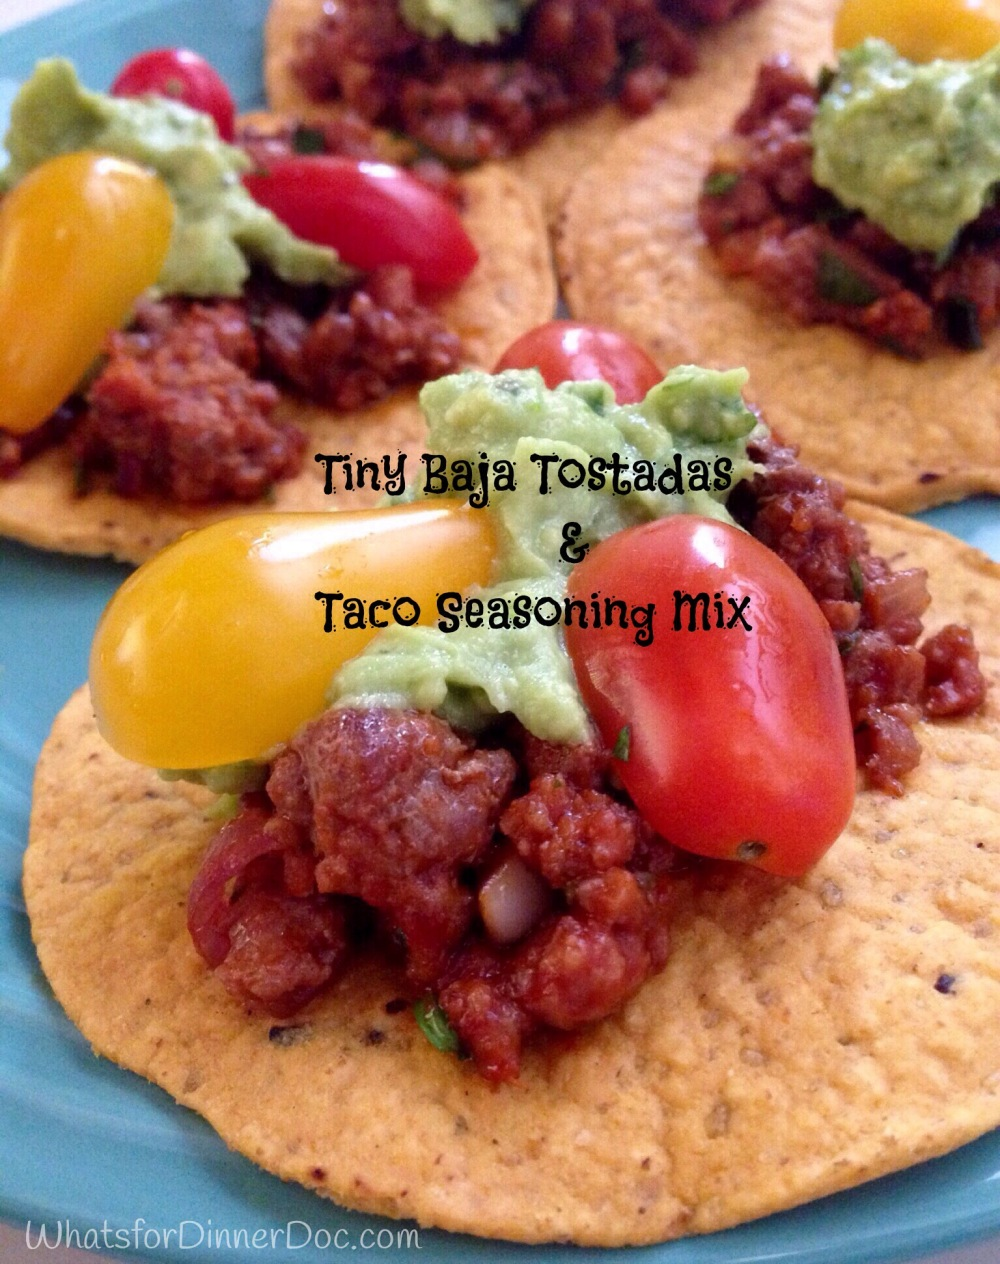 Tiny Baja Tostadas